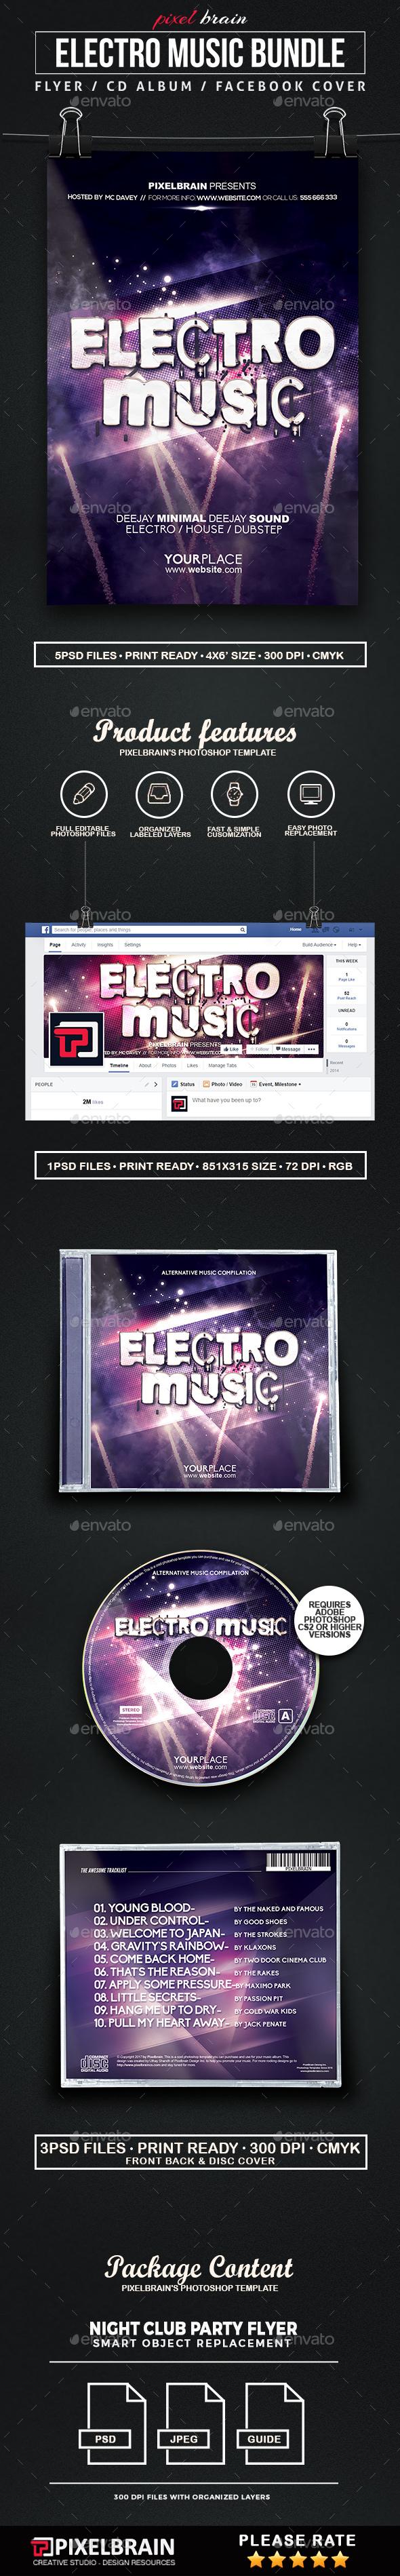 Electro Music Template Bundle - Print Templates